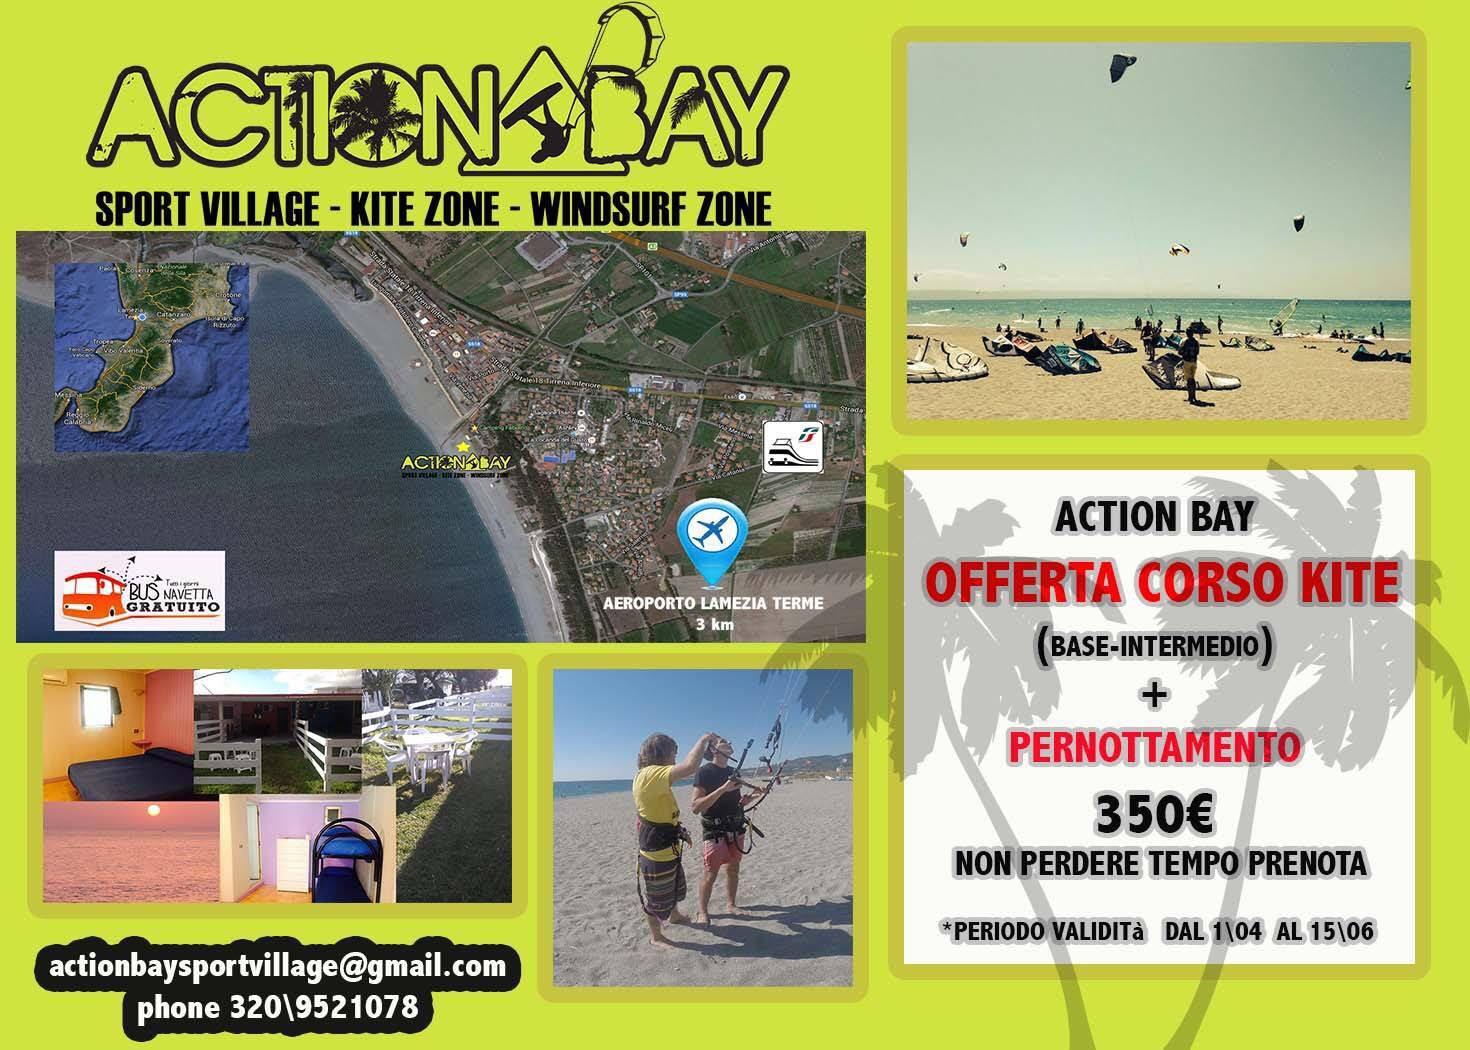 action bay fabiano kite surf